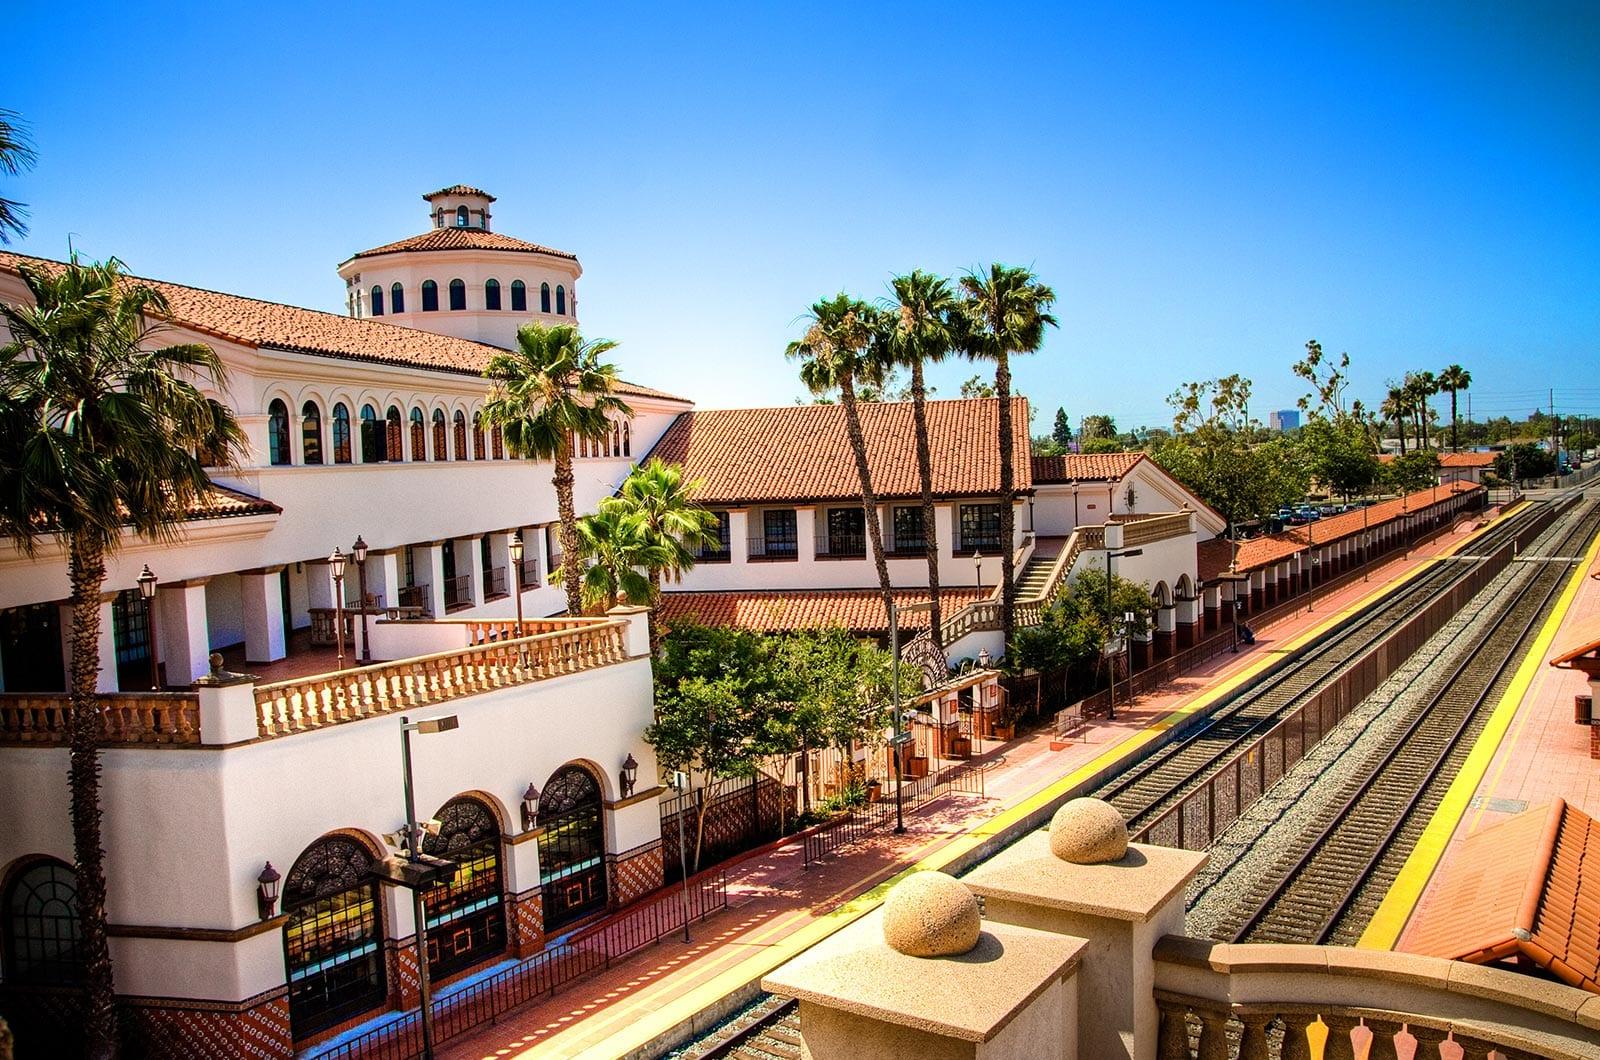 Santa Ana 3D Tour Service Provider | Santa Ana 360 Photography Services | Santa Ana Aerial Photography Services | Santa Ana HDR Luxury Real Estate Photography Services